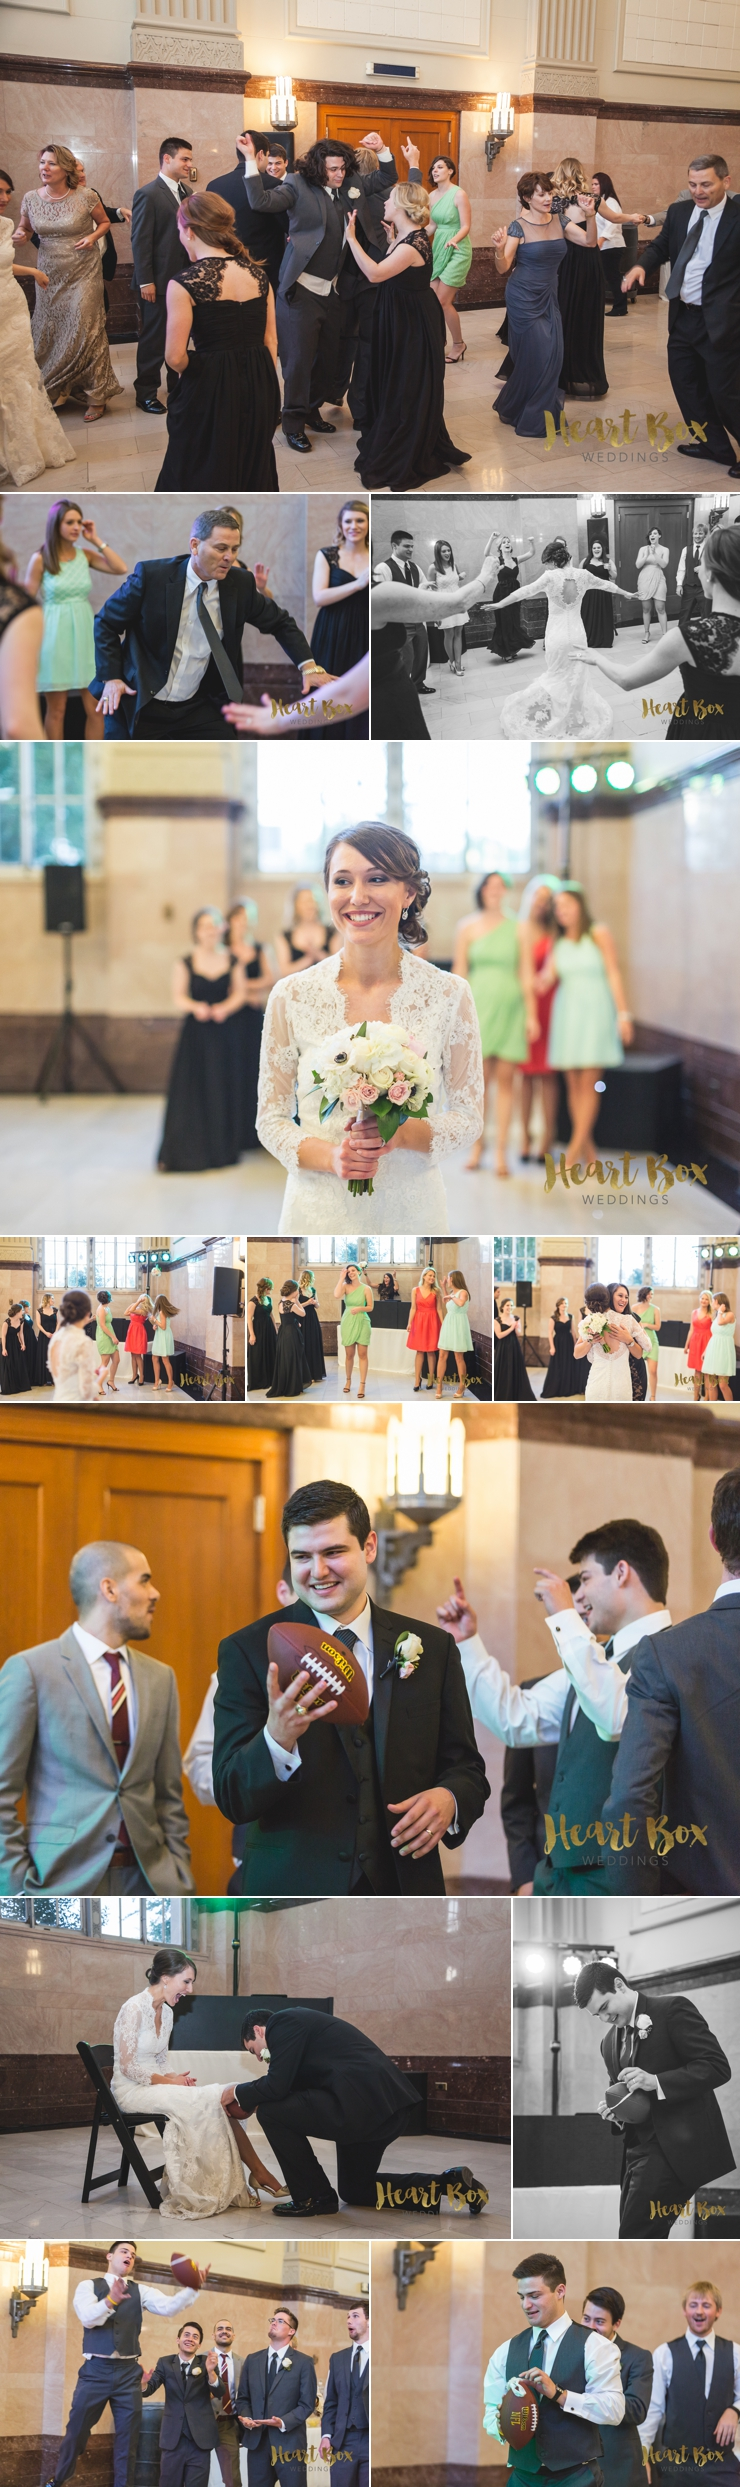 Fegan Wedding Blog Collages 19.jpg